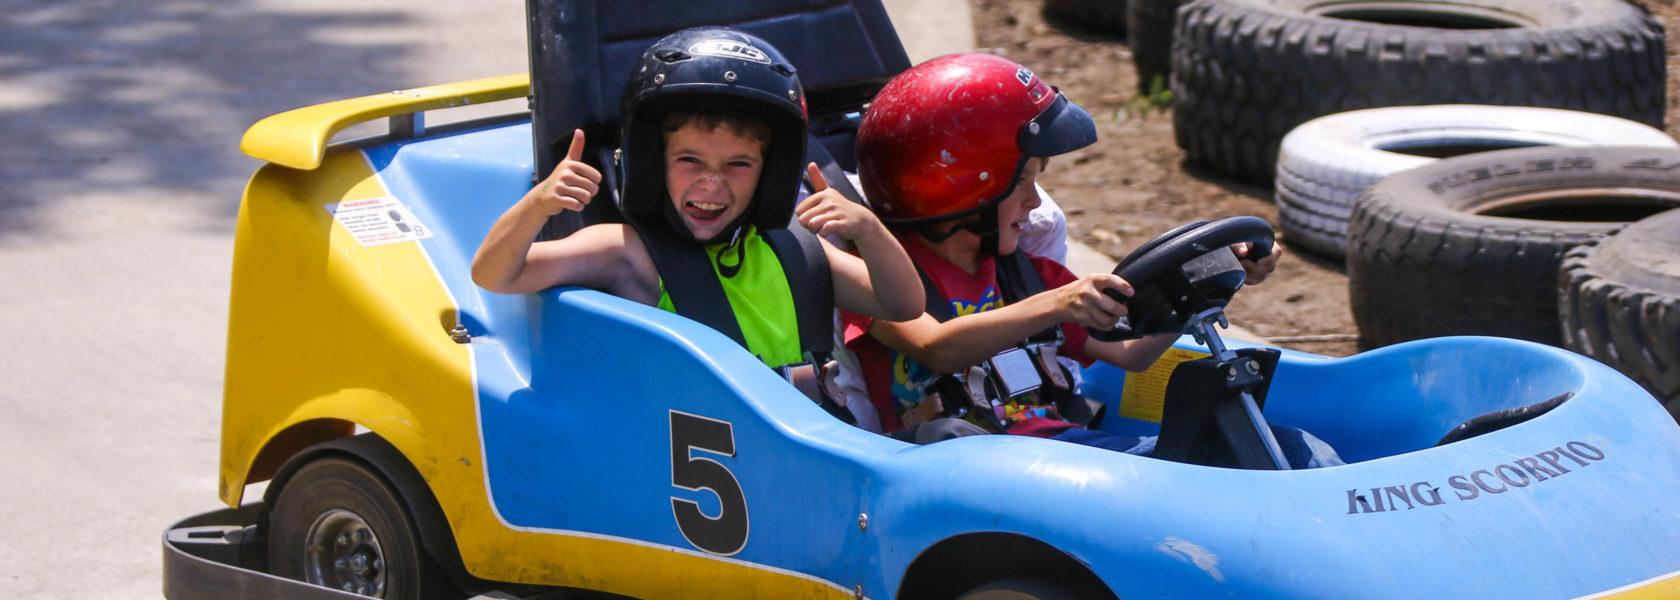 Campers having fun go-karting